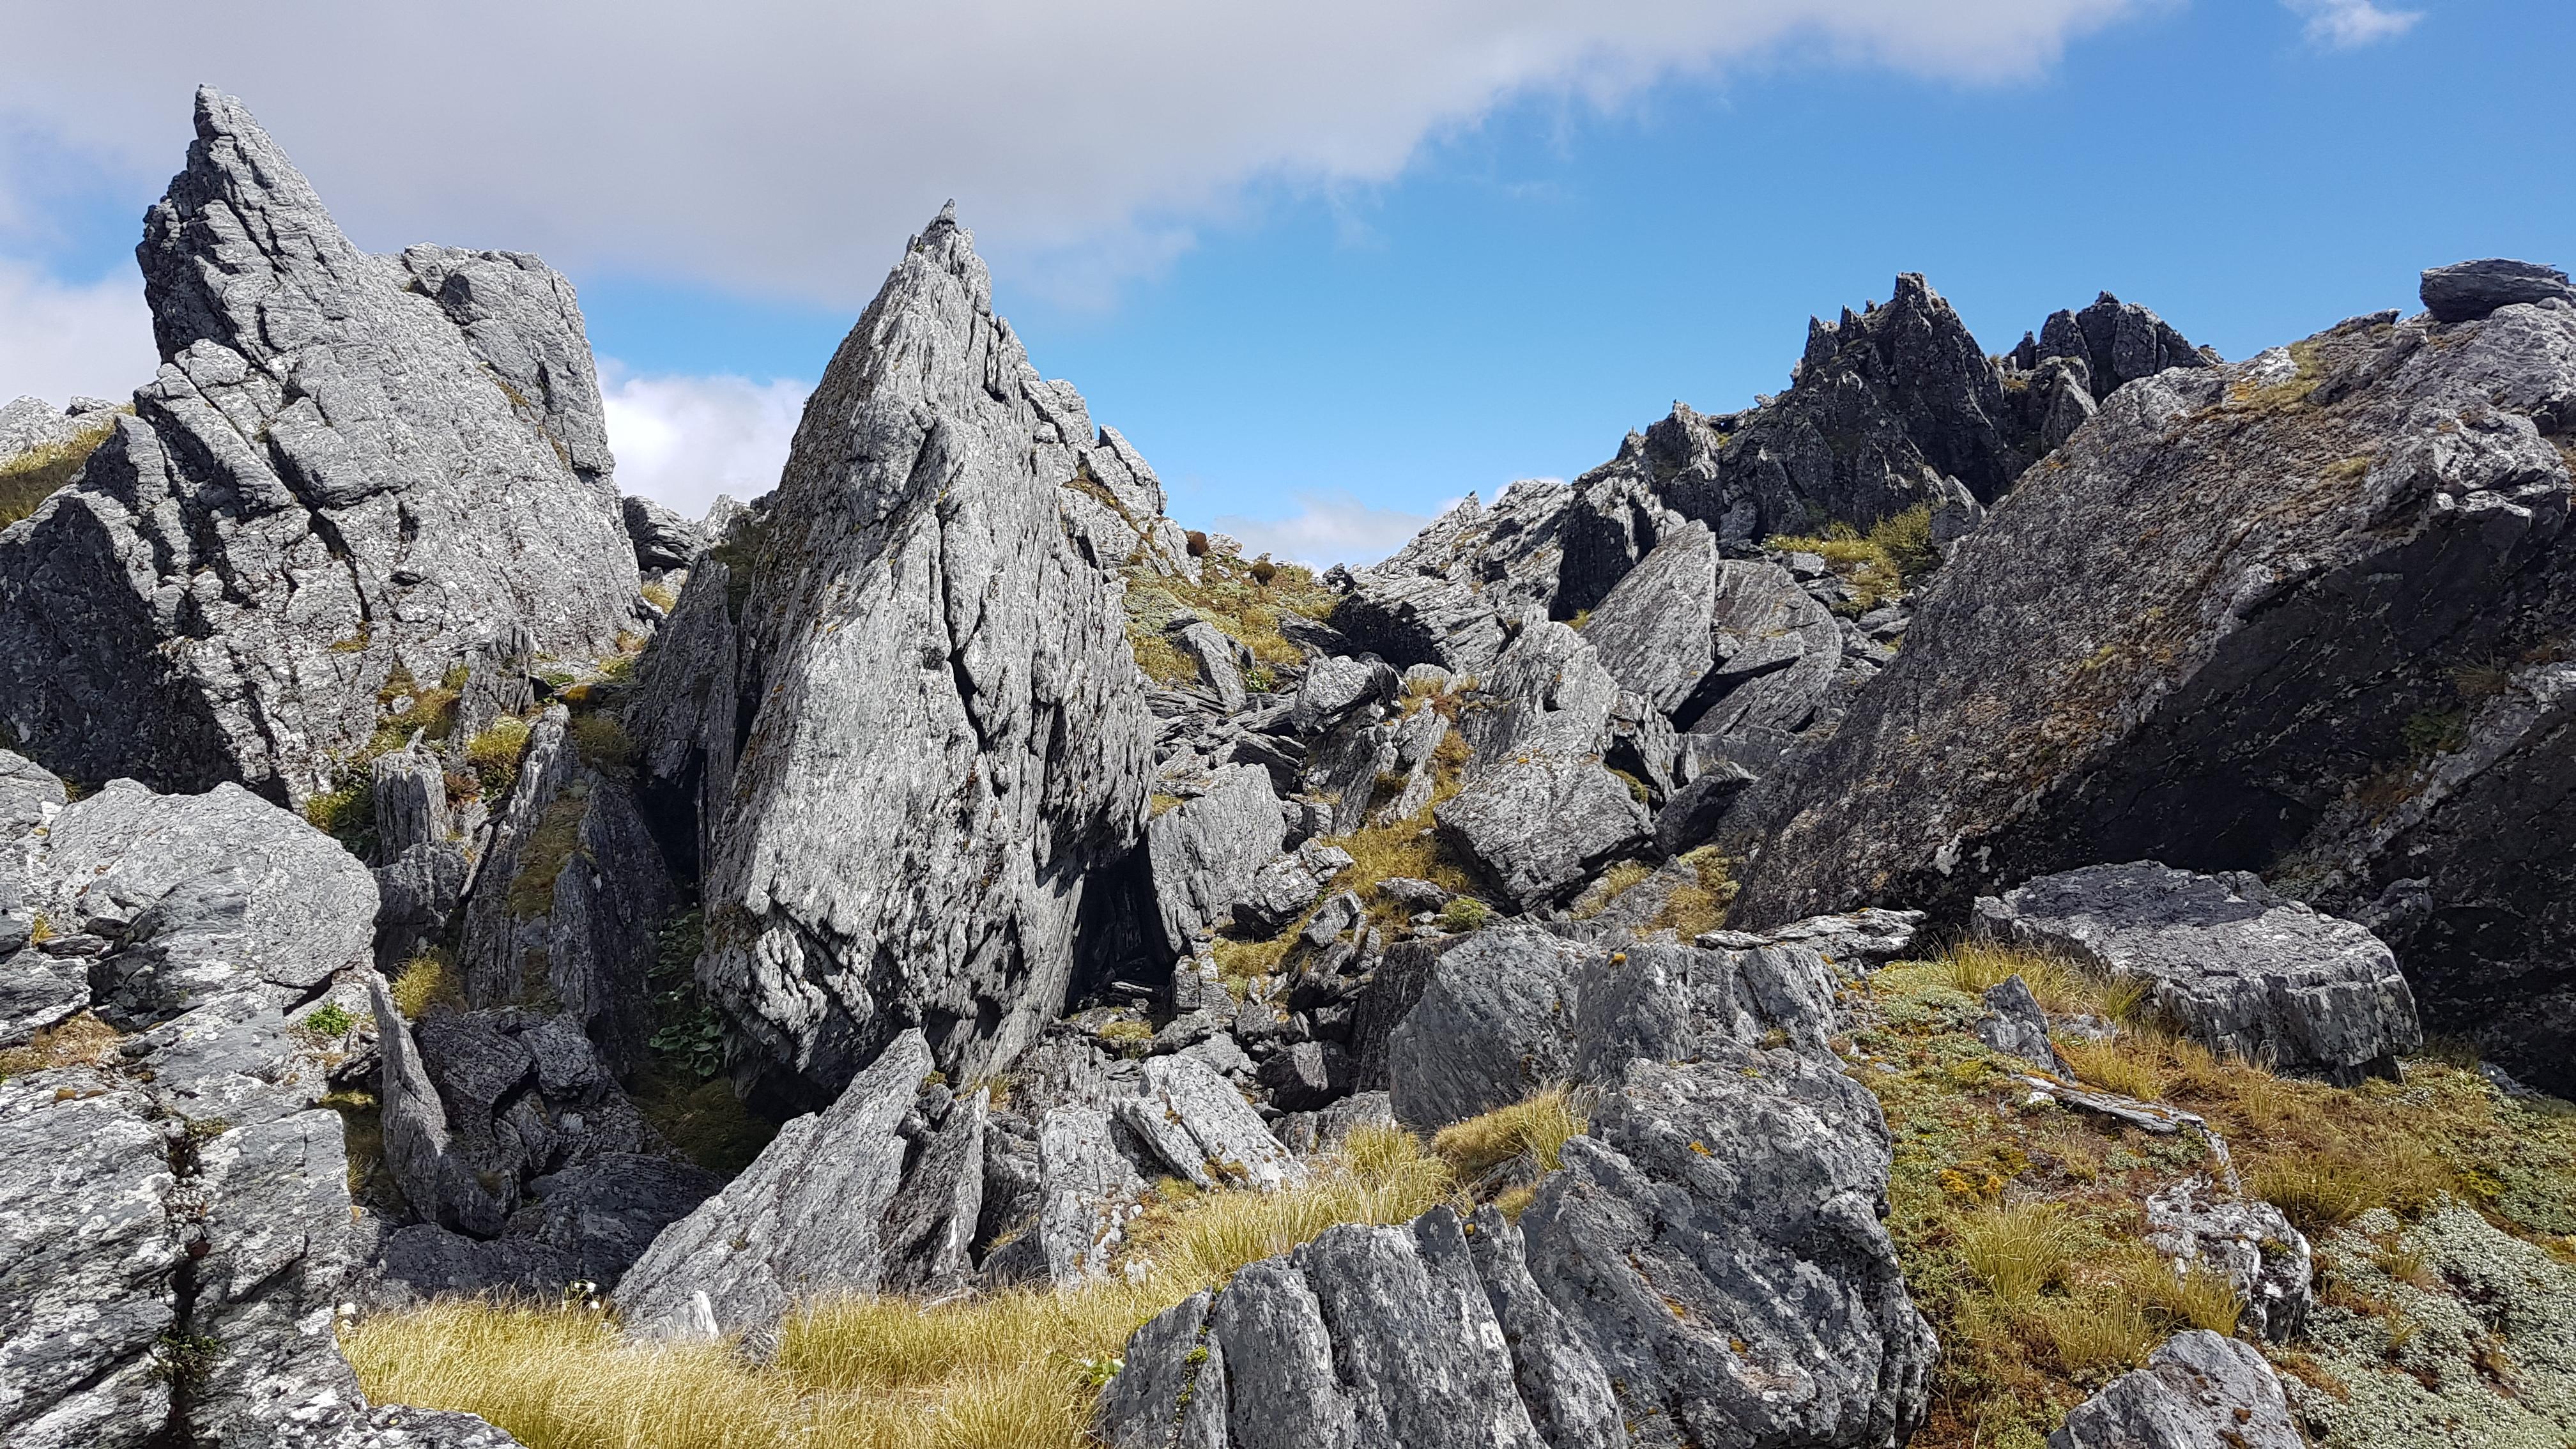 Through the boulder field